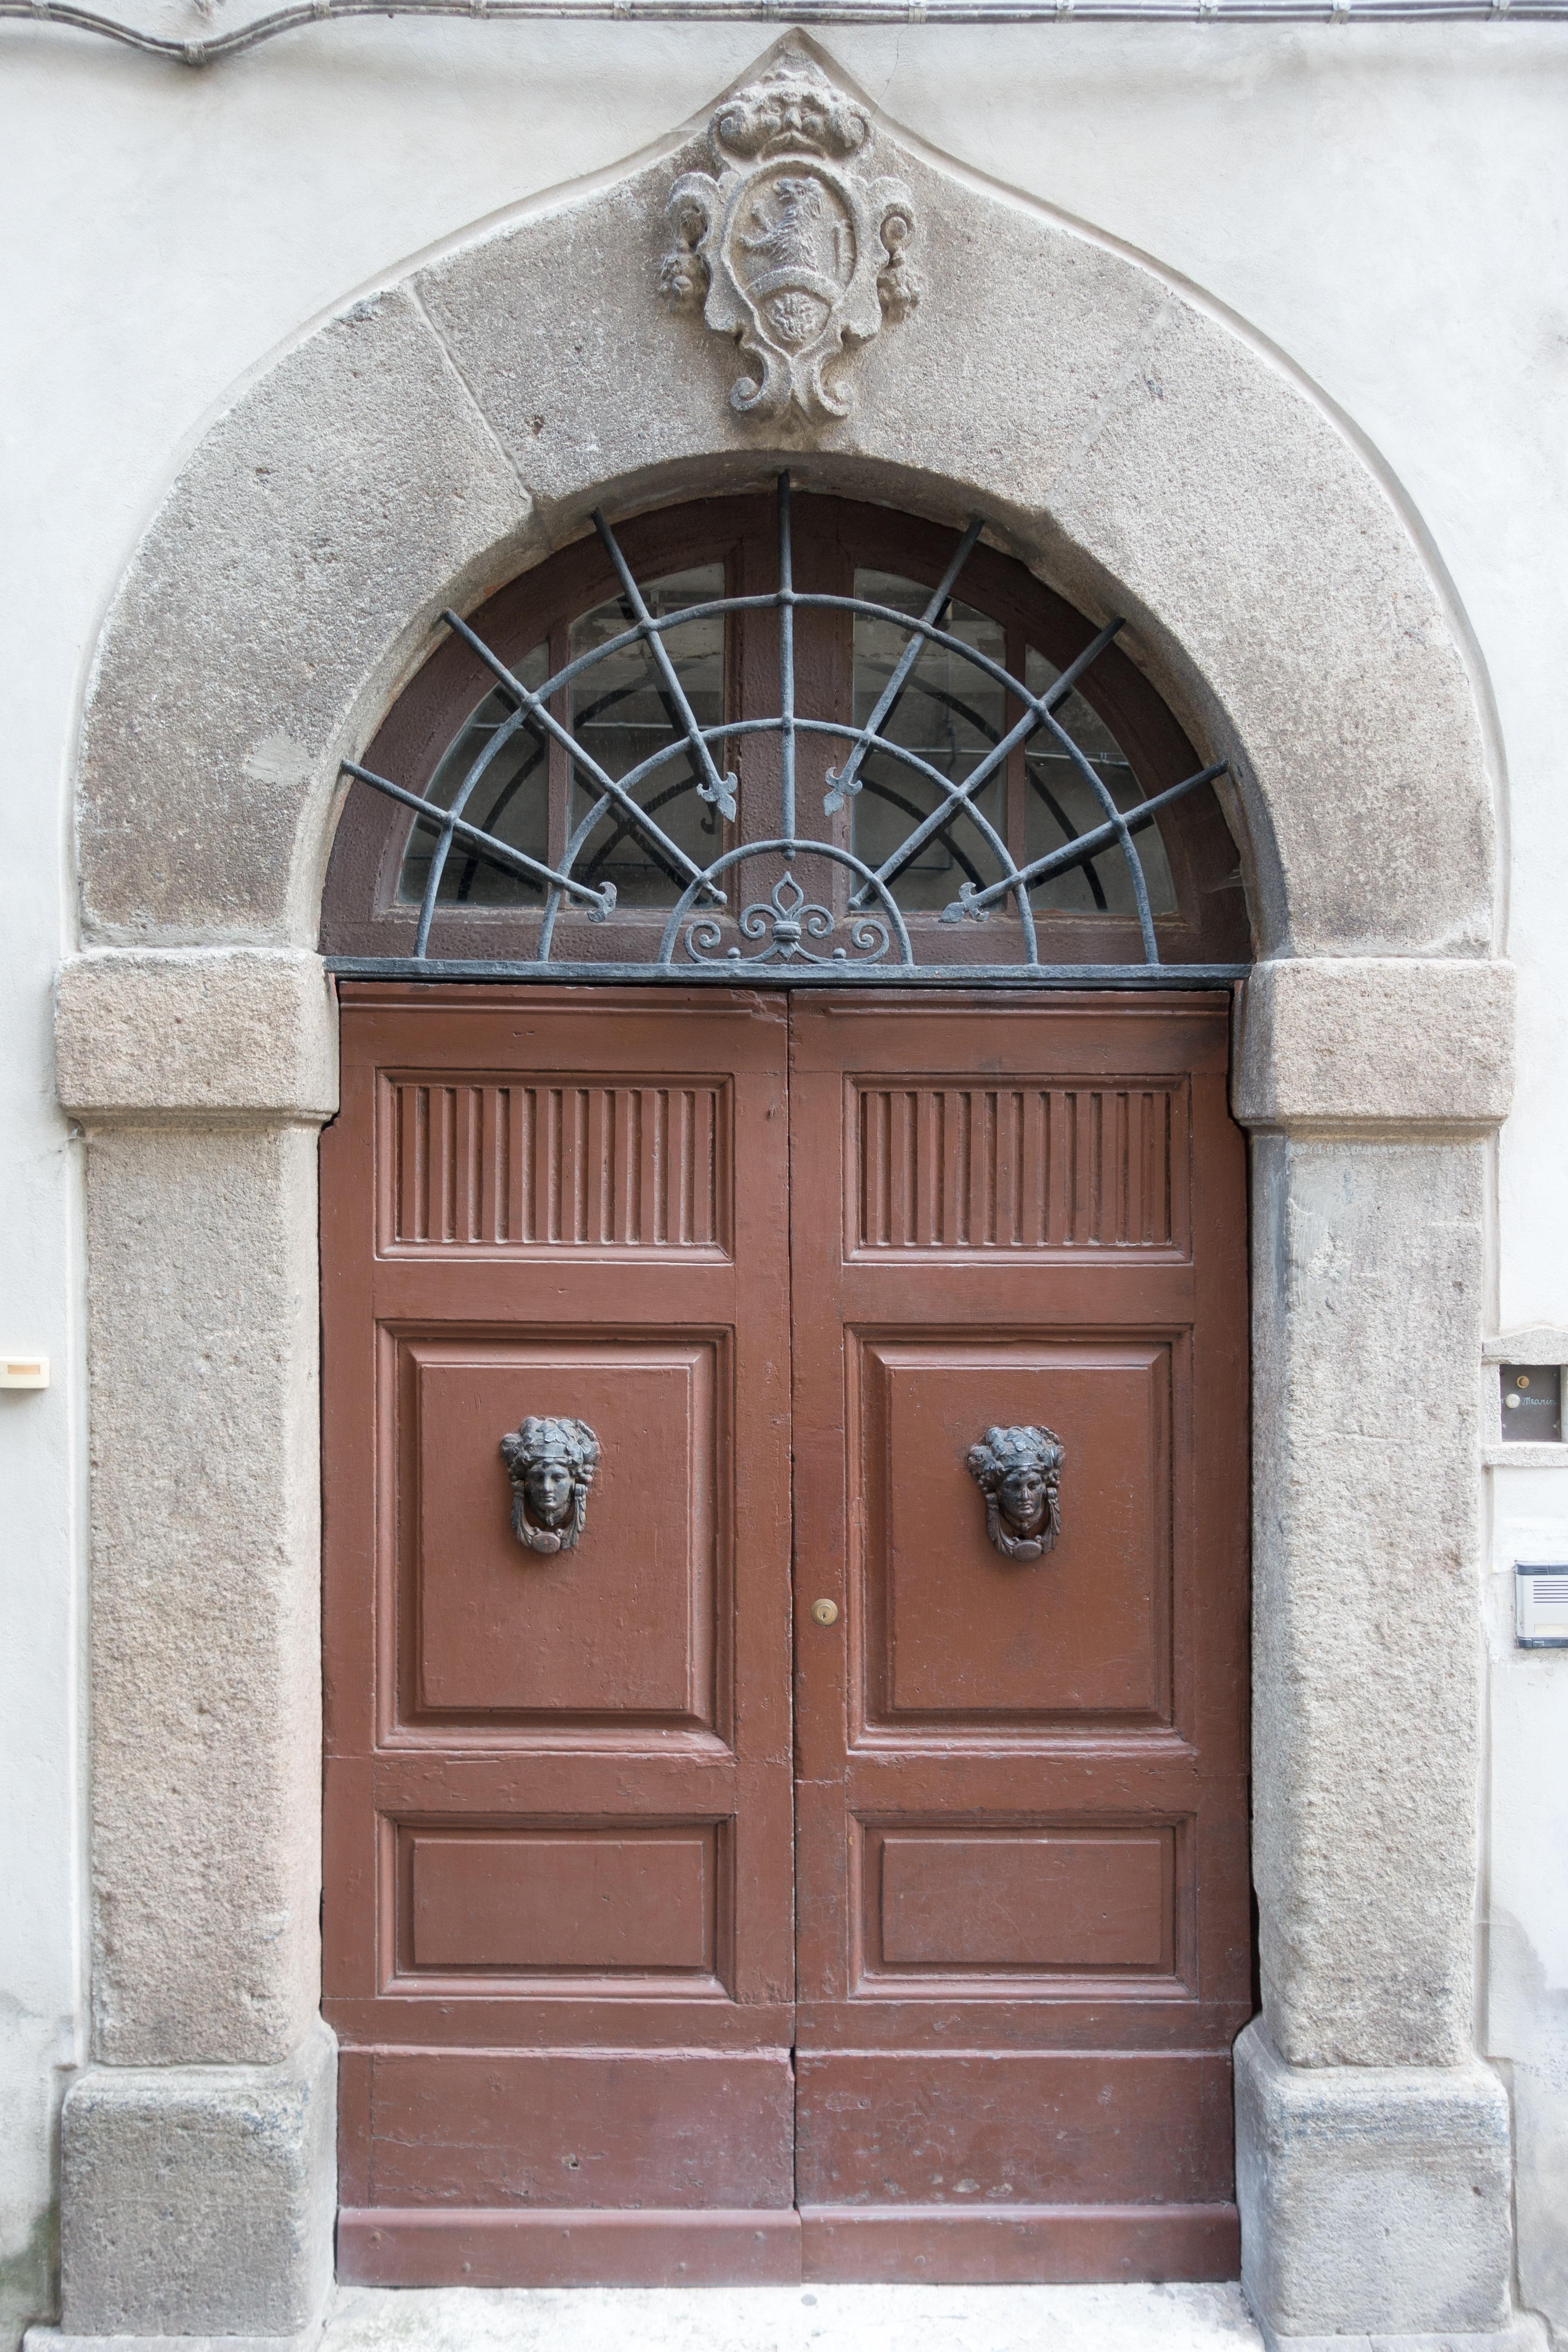 Wonderful Architecture Wood Window Building Home Arch Facade Gate Door Apartment  Front Door Input House Entrance Portal